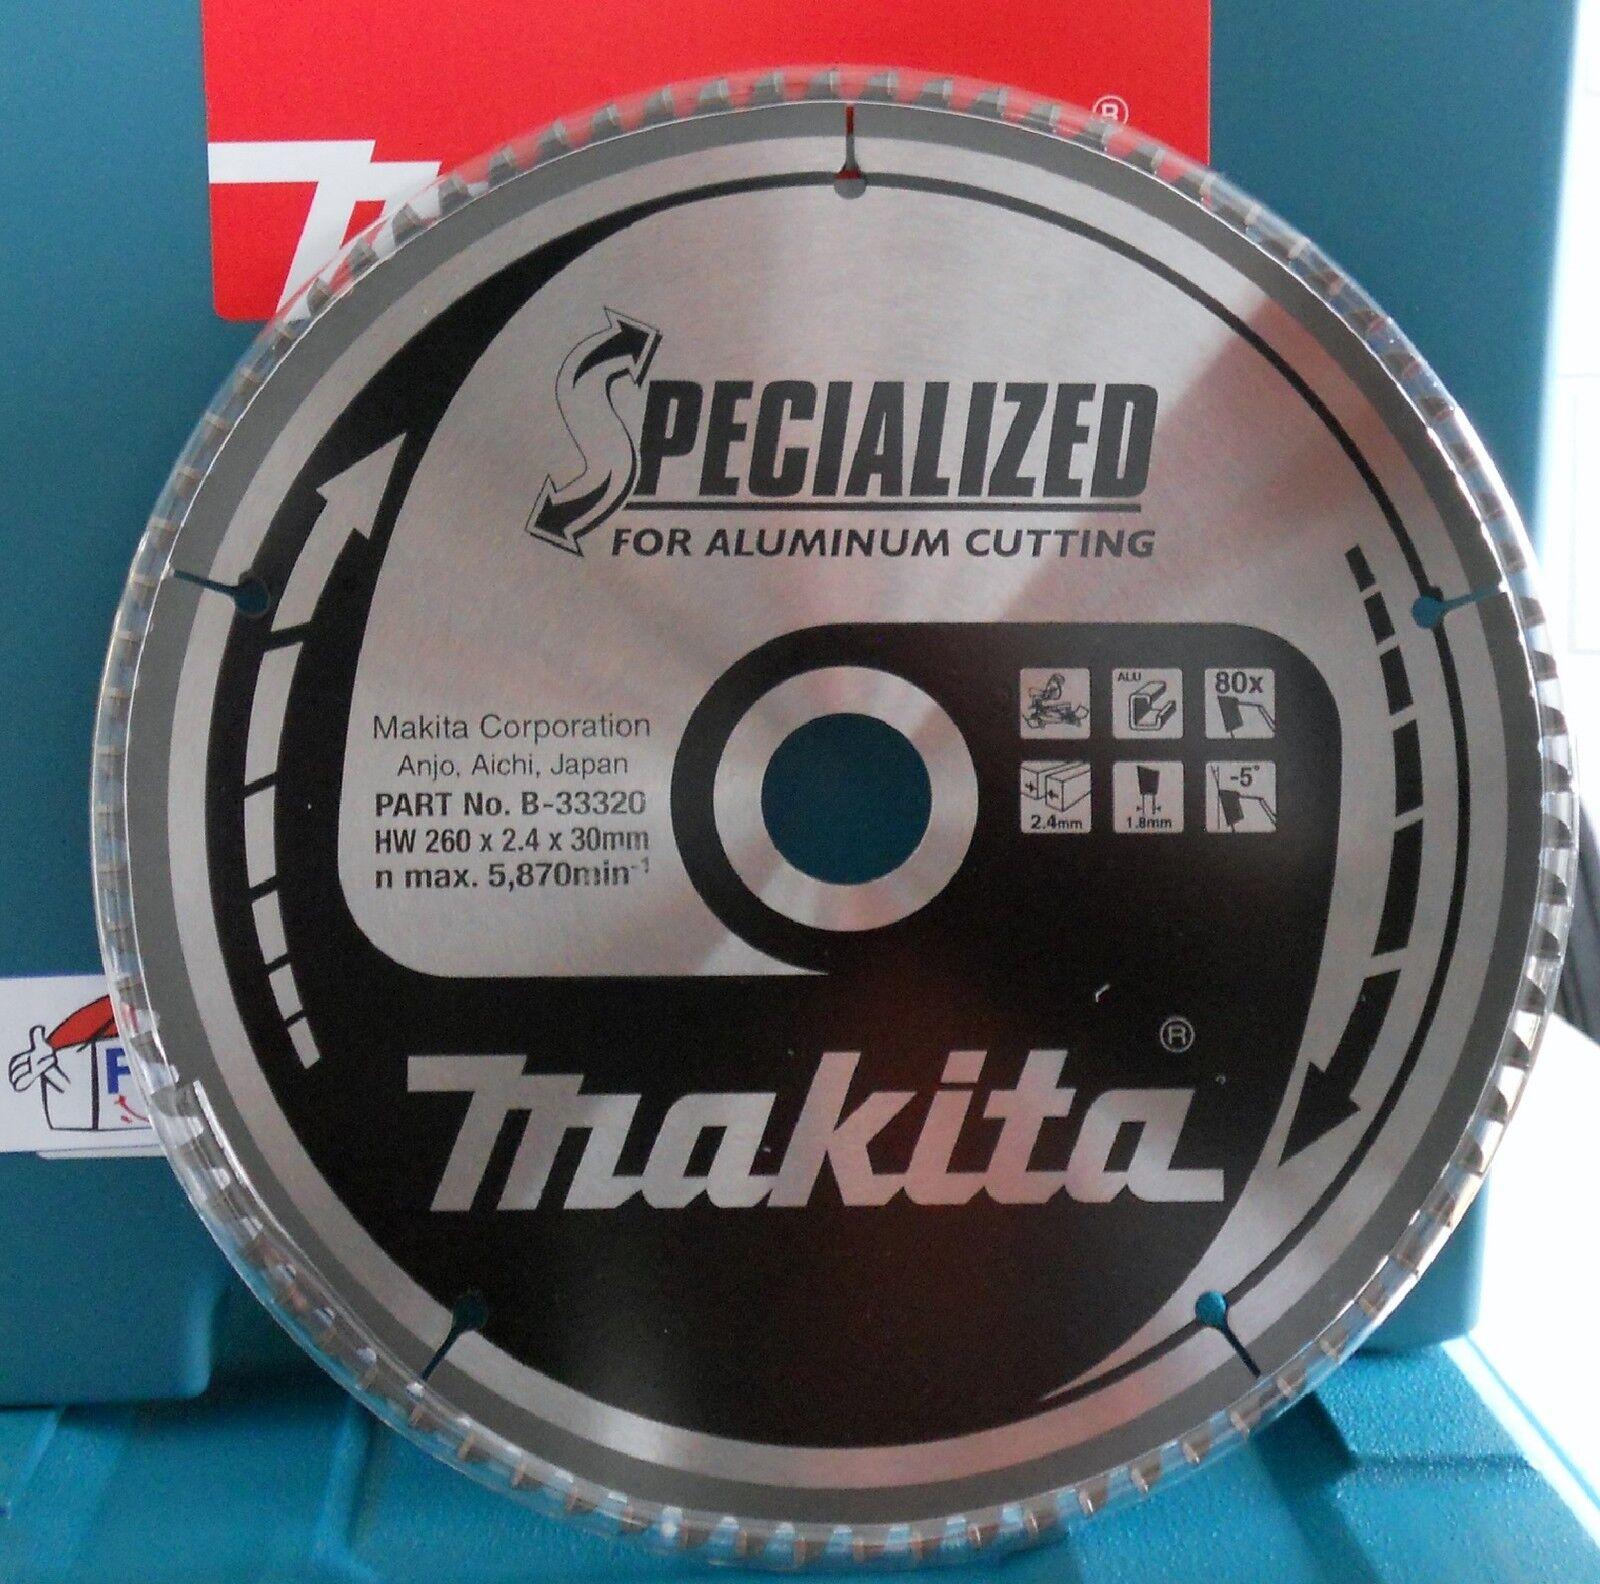 Makita Sägeblatt SPECIALIZED 260x30mm B-33320 MSA26080G Spezial - Aluminium